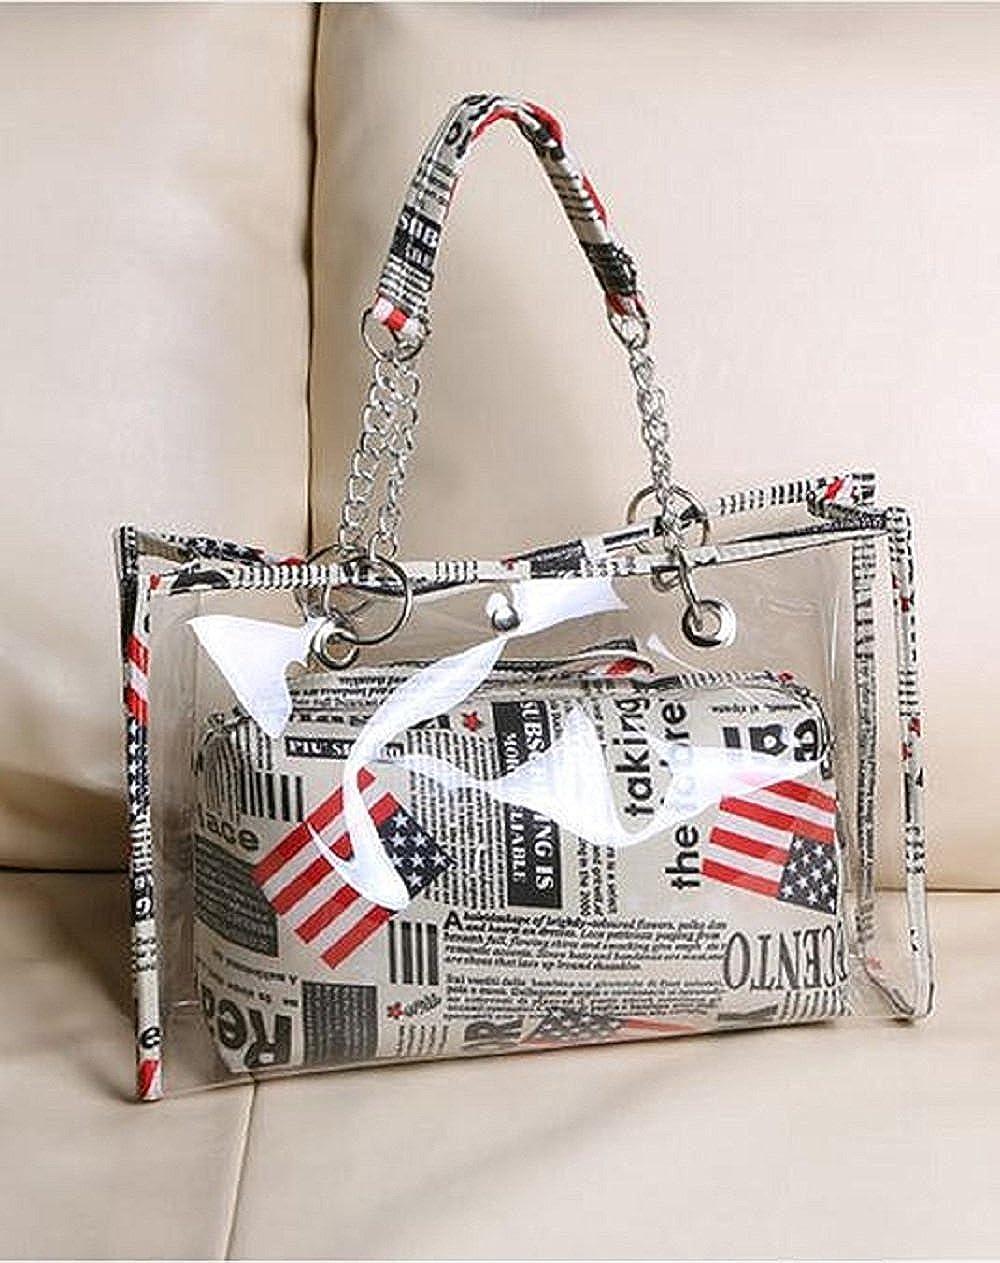 2 In 1 Clear Tote Bag Transparent Beach Shoulder Bag Wallet Swimming Purse Handbags